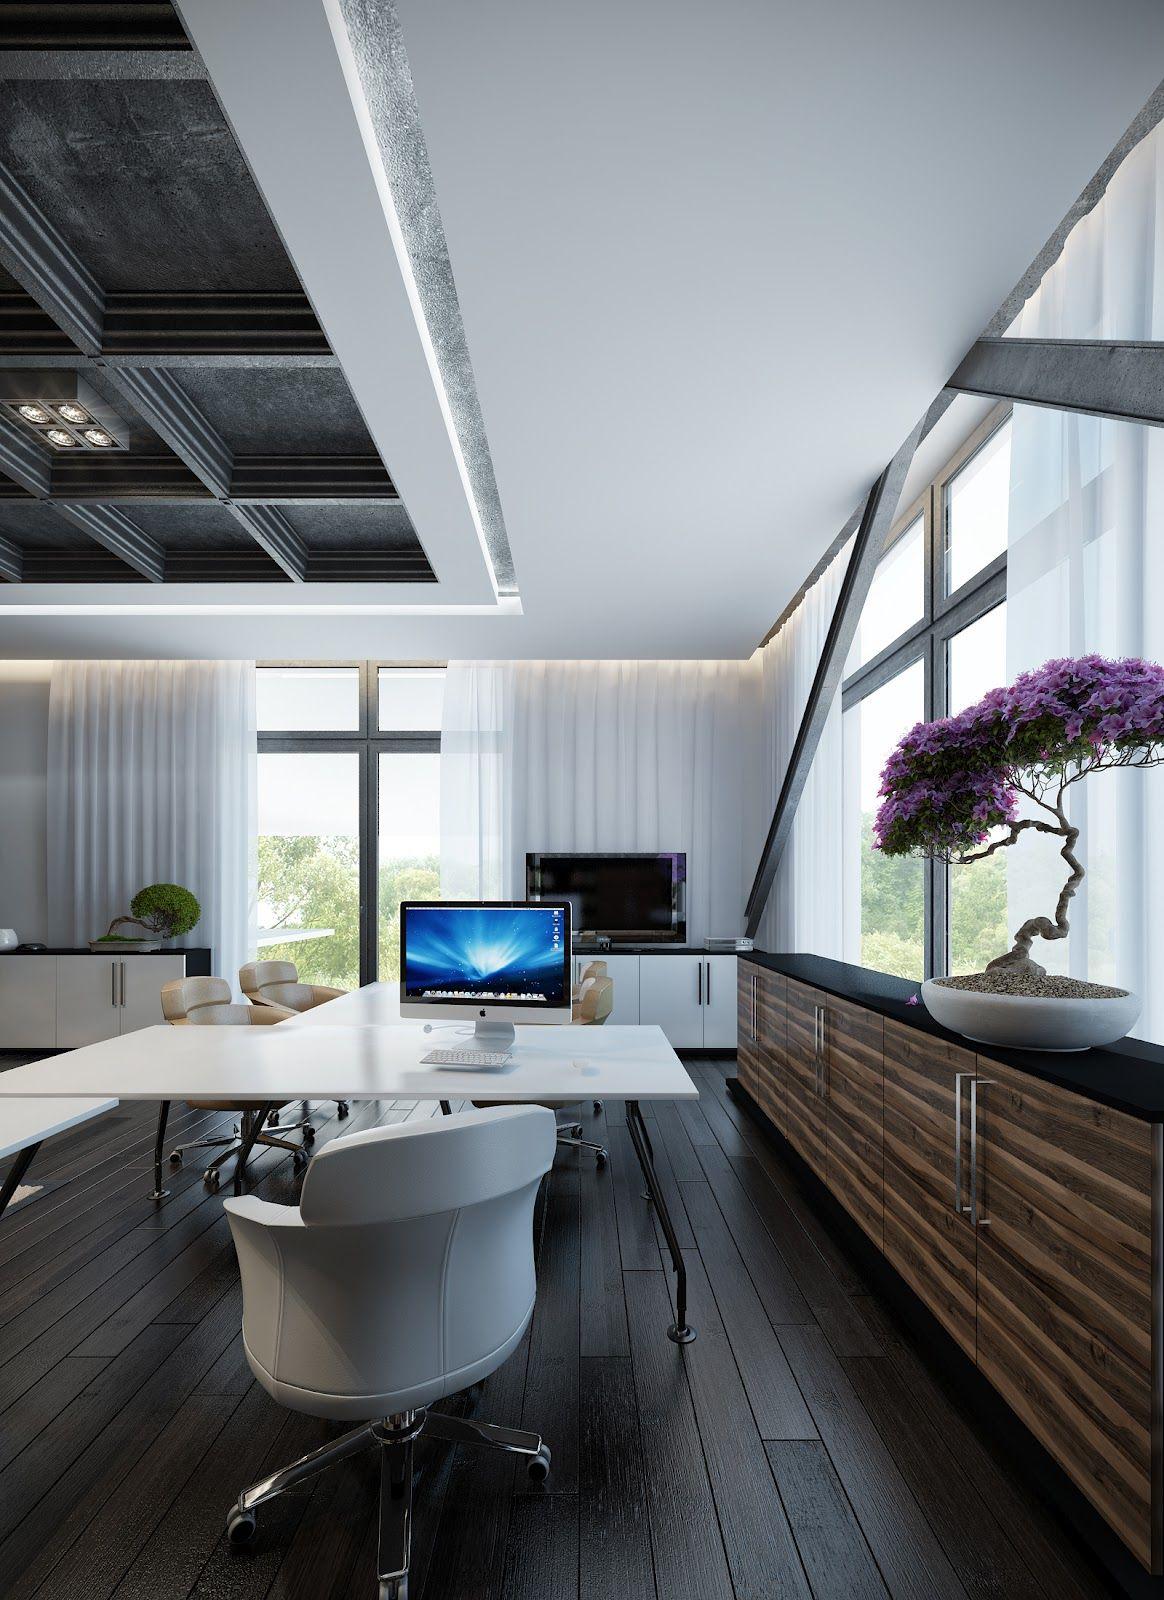 zen office design. 25 Contemporary Home Office You Are Guaranteed To Love Zen Design C